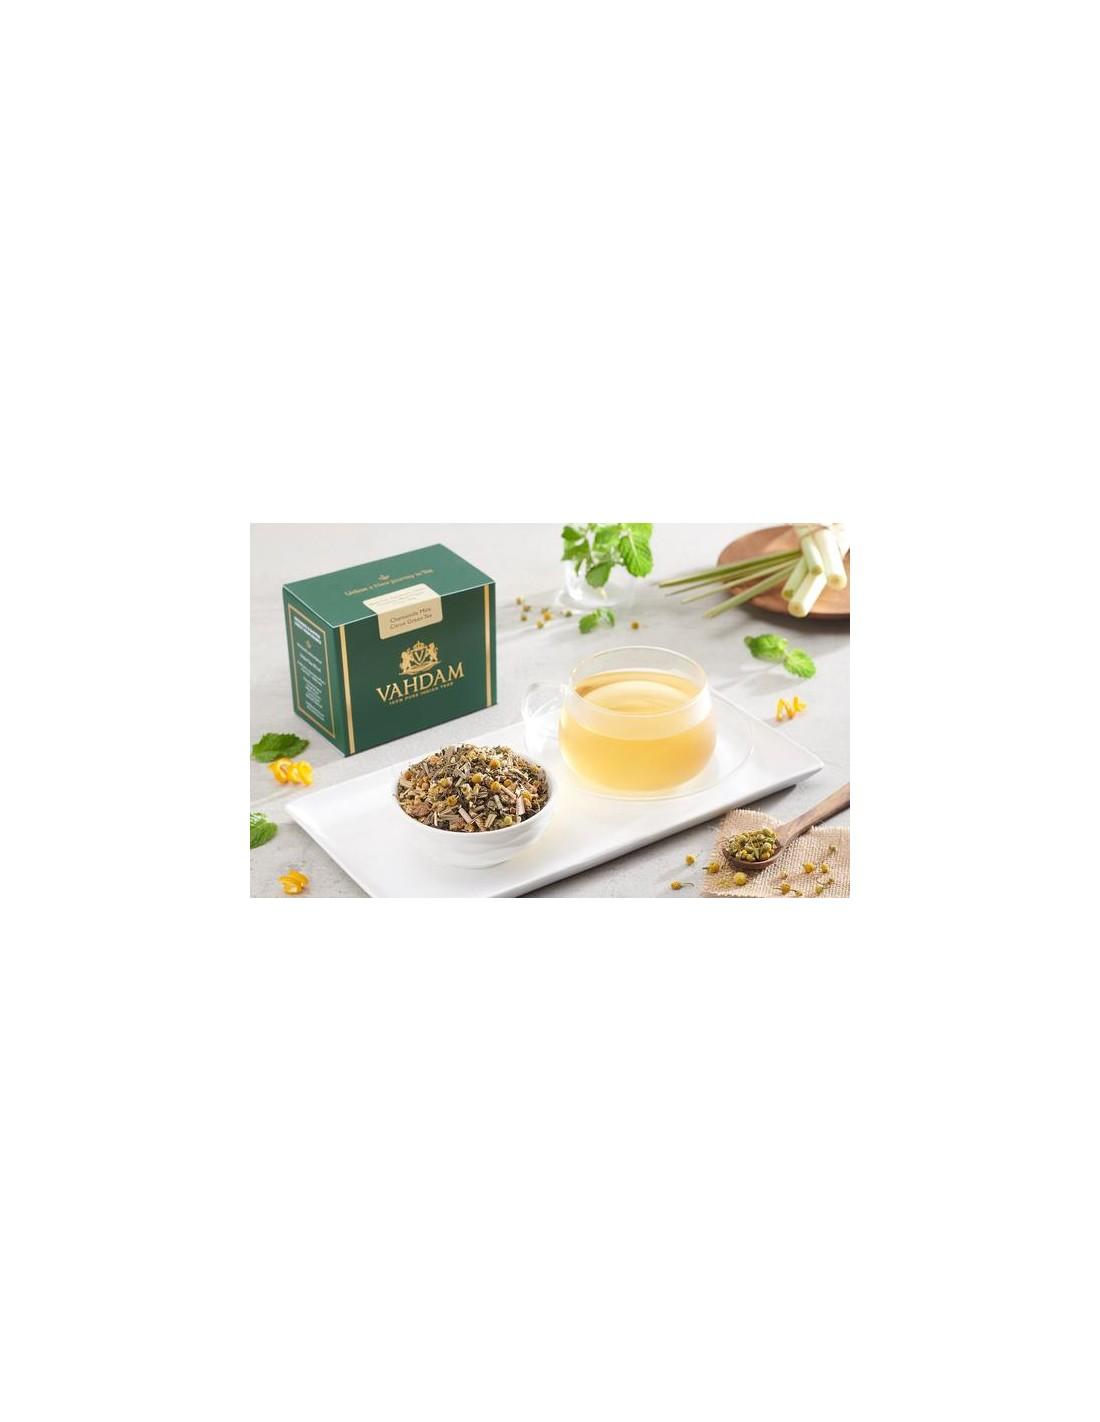 Chamomile Mint Citrus Green Tea - Republika Smaków Sp. z o.o.